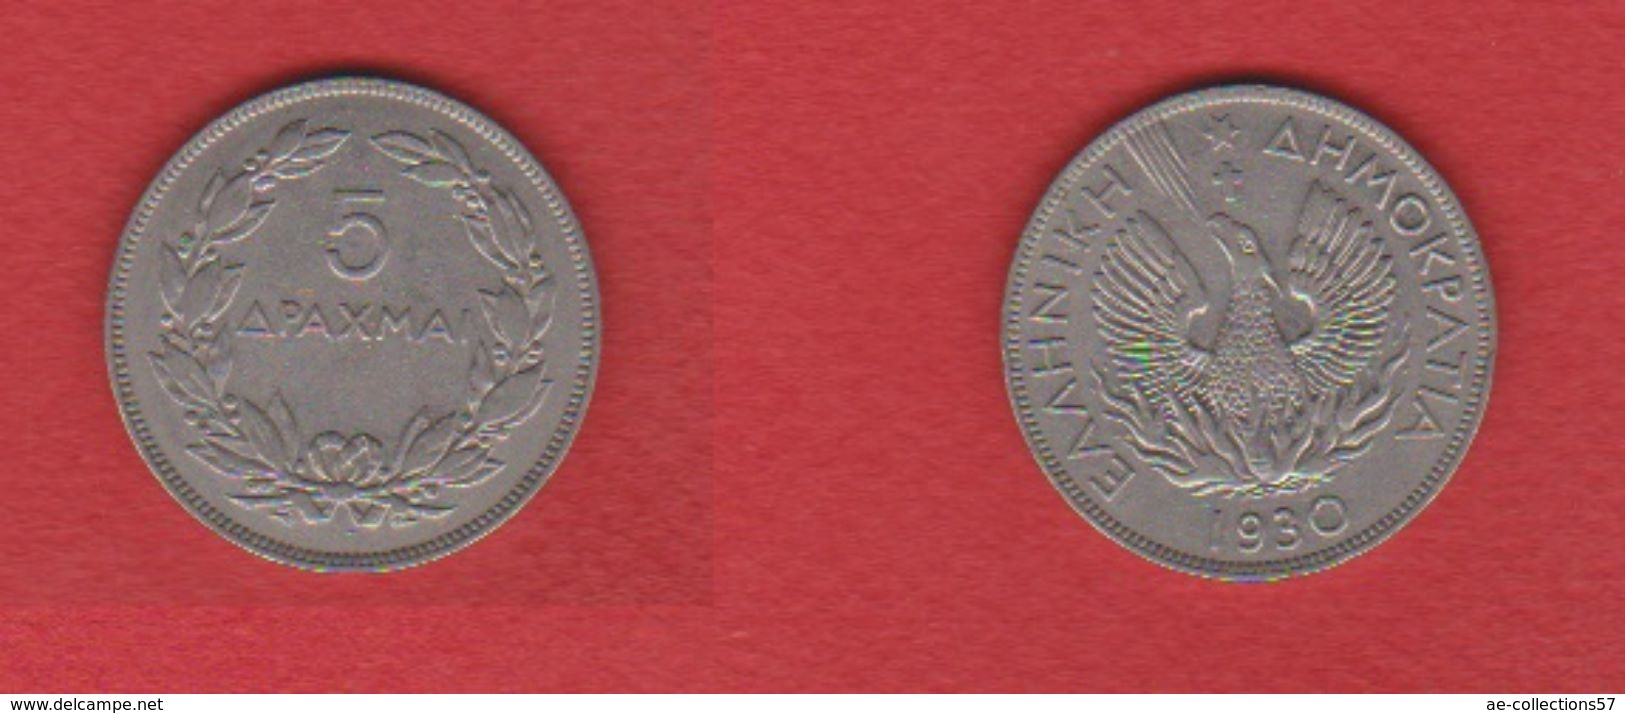 Grèce   / 5 Drachmes 1930 / TTB / KM 71.1 - Grèce